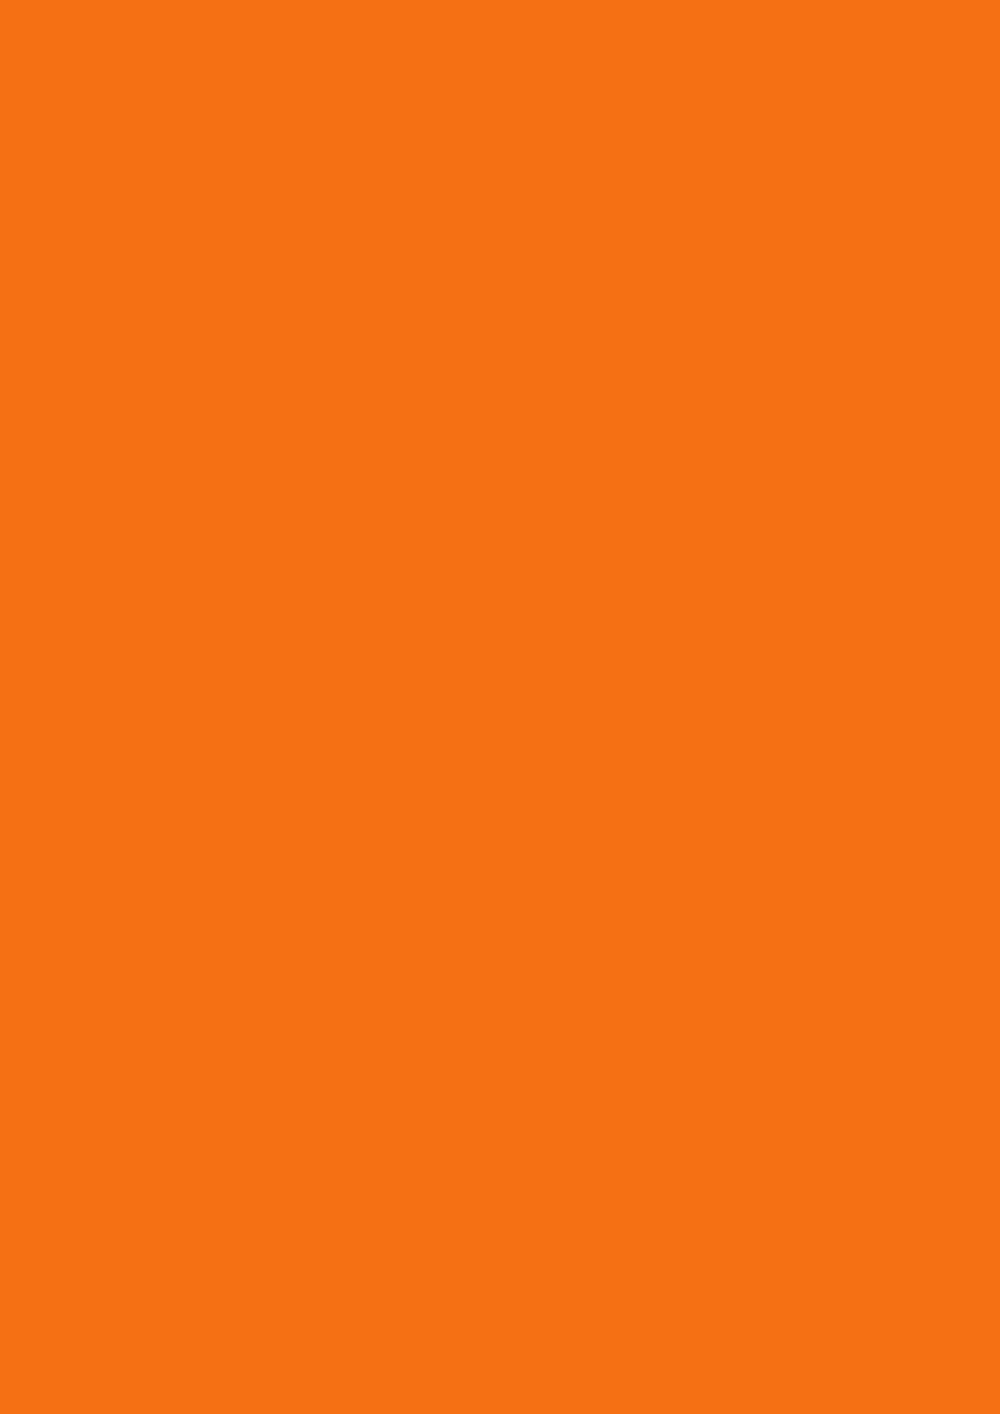 new nordic investment, new nordic project development, new nordic hospitality, new nordic travel,  ,turn key investment solutions phuket thailand,loch palm golf club phuket ,red mountain golf club phuket, blue canyon country club phuket, laguna phuket golf club ,banana beach phuket, freedom beach phuket, nai thon beach phuket, phuket international airport, bangtao beach, BRITISH & FAR EAST TRADERS & PARTNERS, phuket water world, phuket thailand investments, southeast asian investments